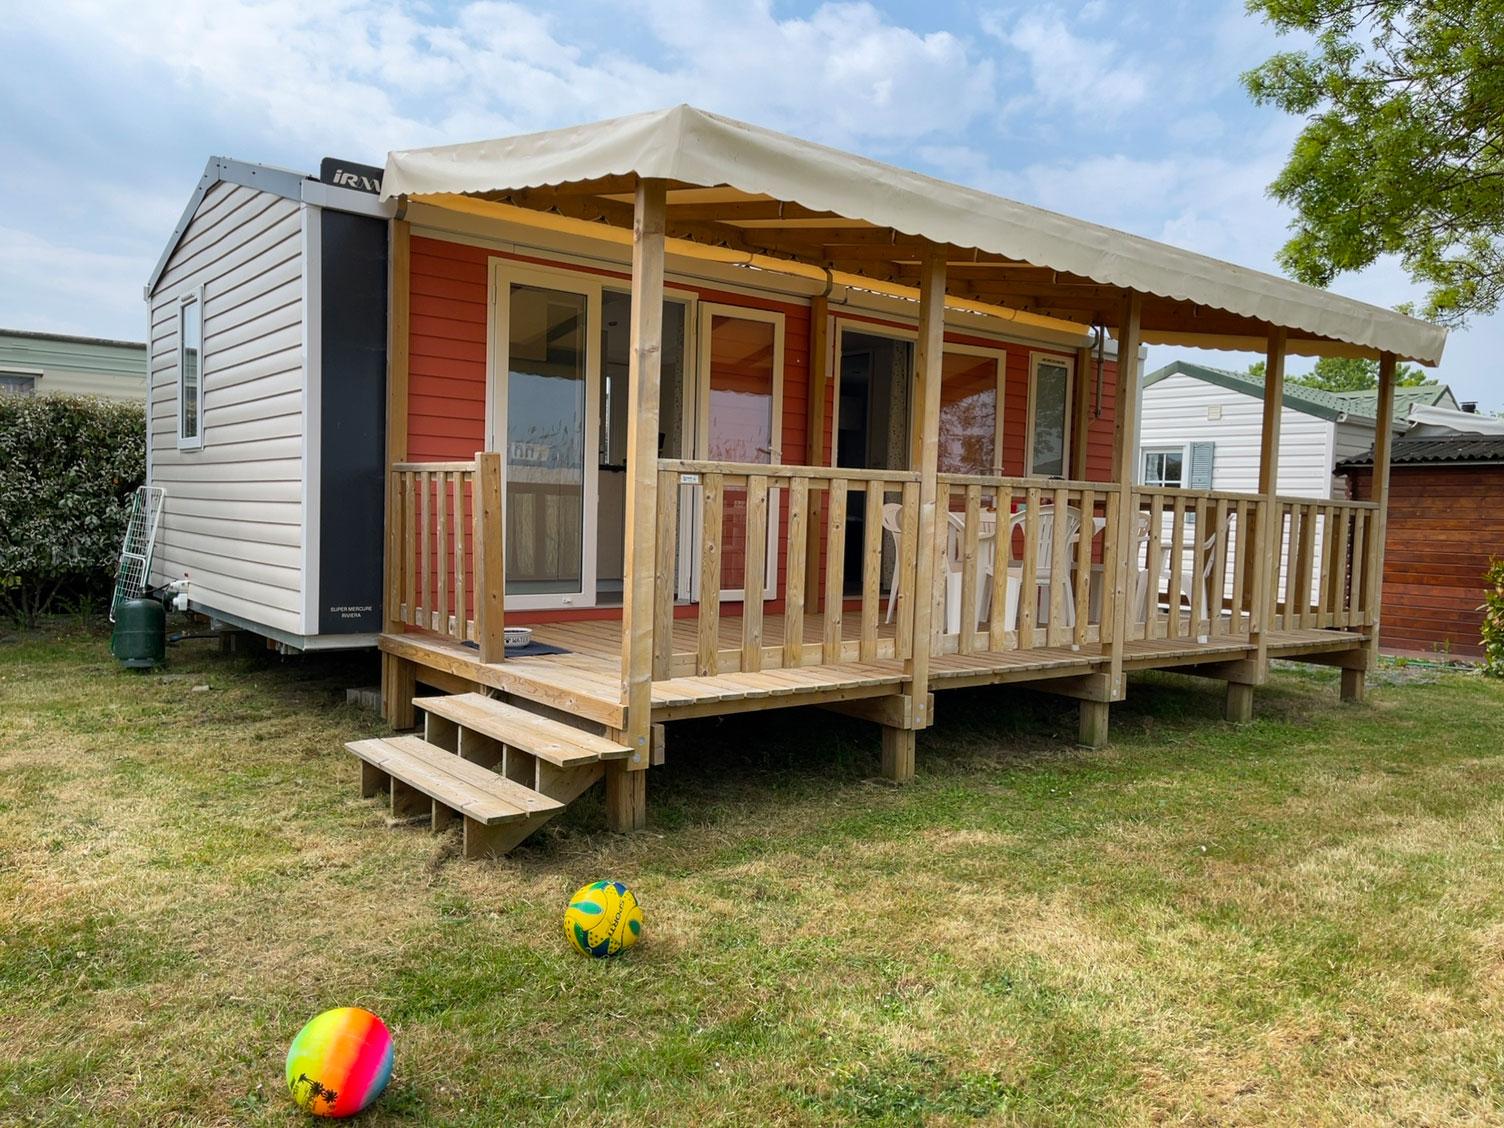 galerie-location-mobil-home-4-6-personnes-prestige-exterieur-camping-moricq